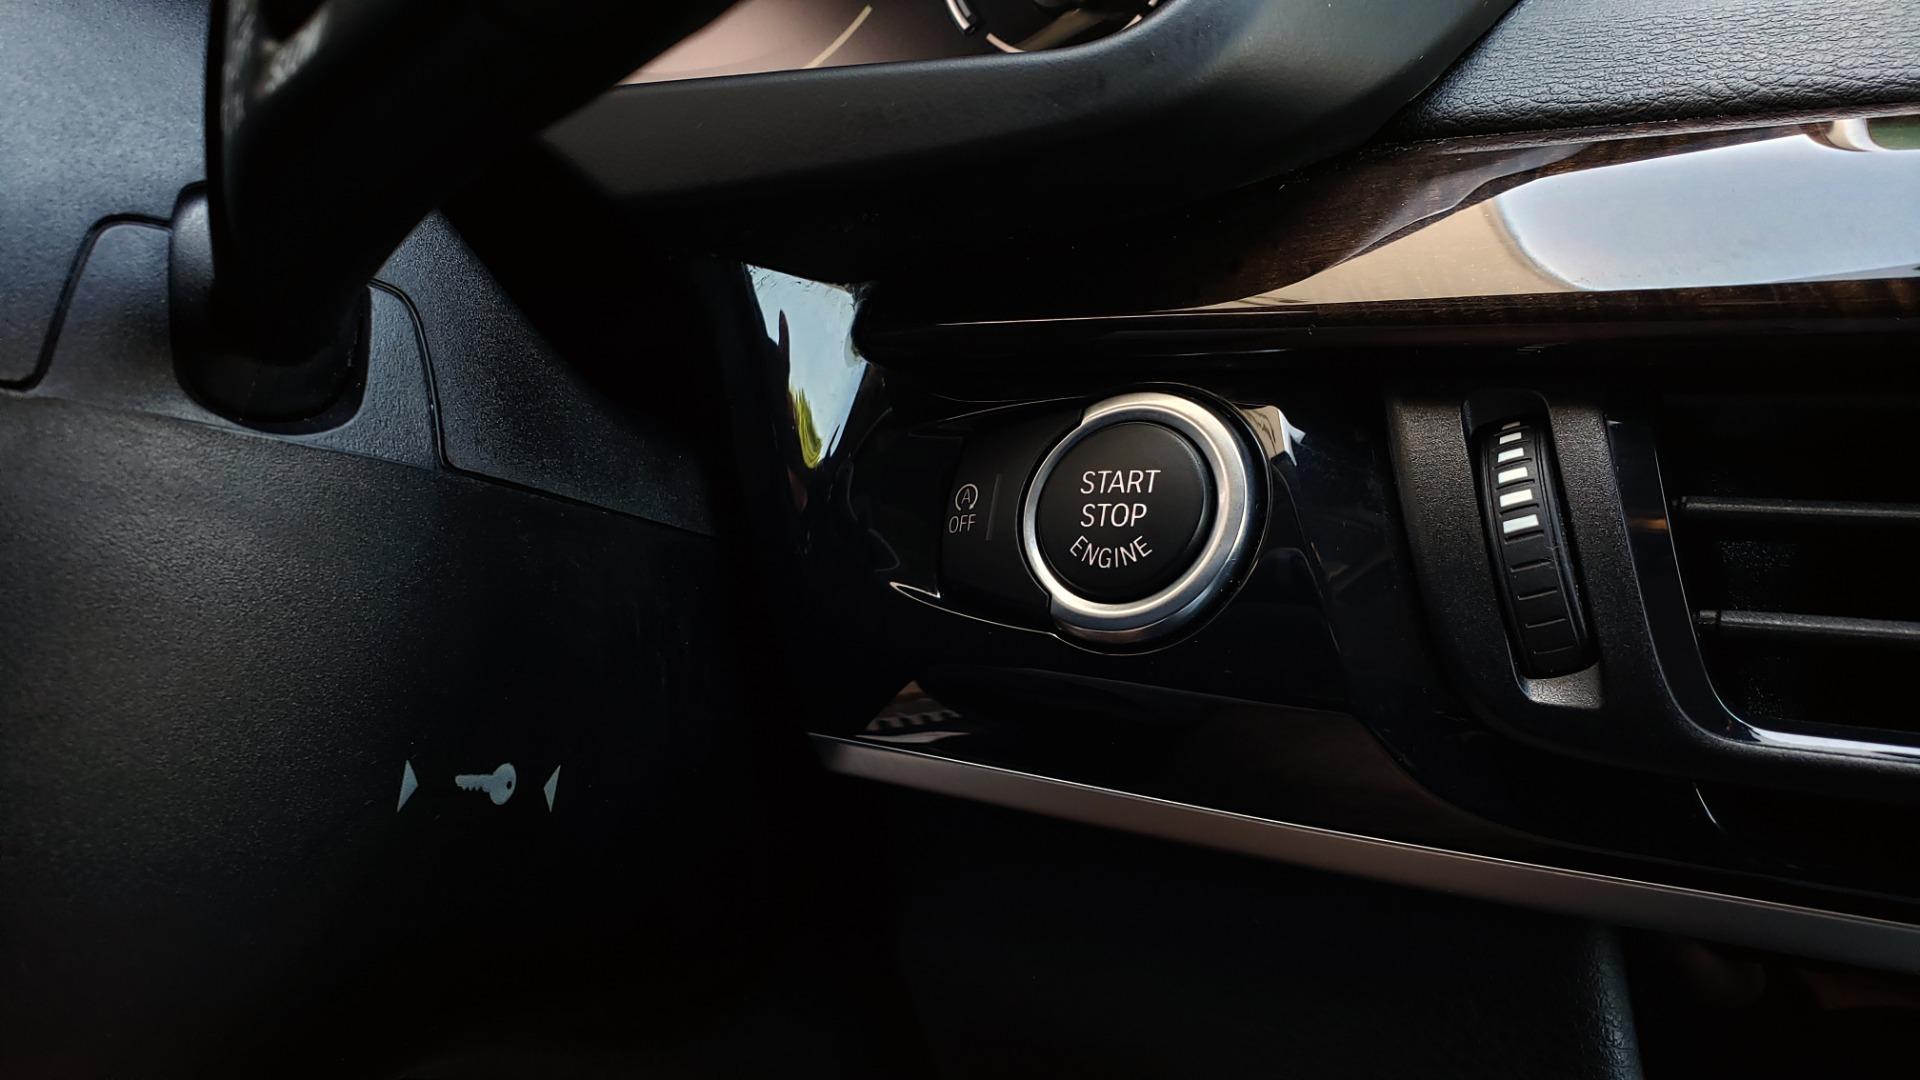 Used 2016 BMW X5 XDRIVE35I / PREM PKG / NAV / DRVR ASST PLUS / REARVIEW for sale $25,765 at Formula Imports in Charlotte NC 28227 31